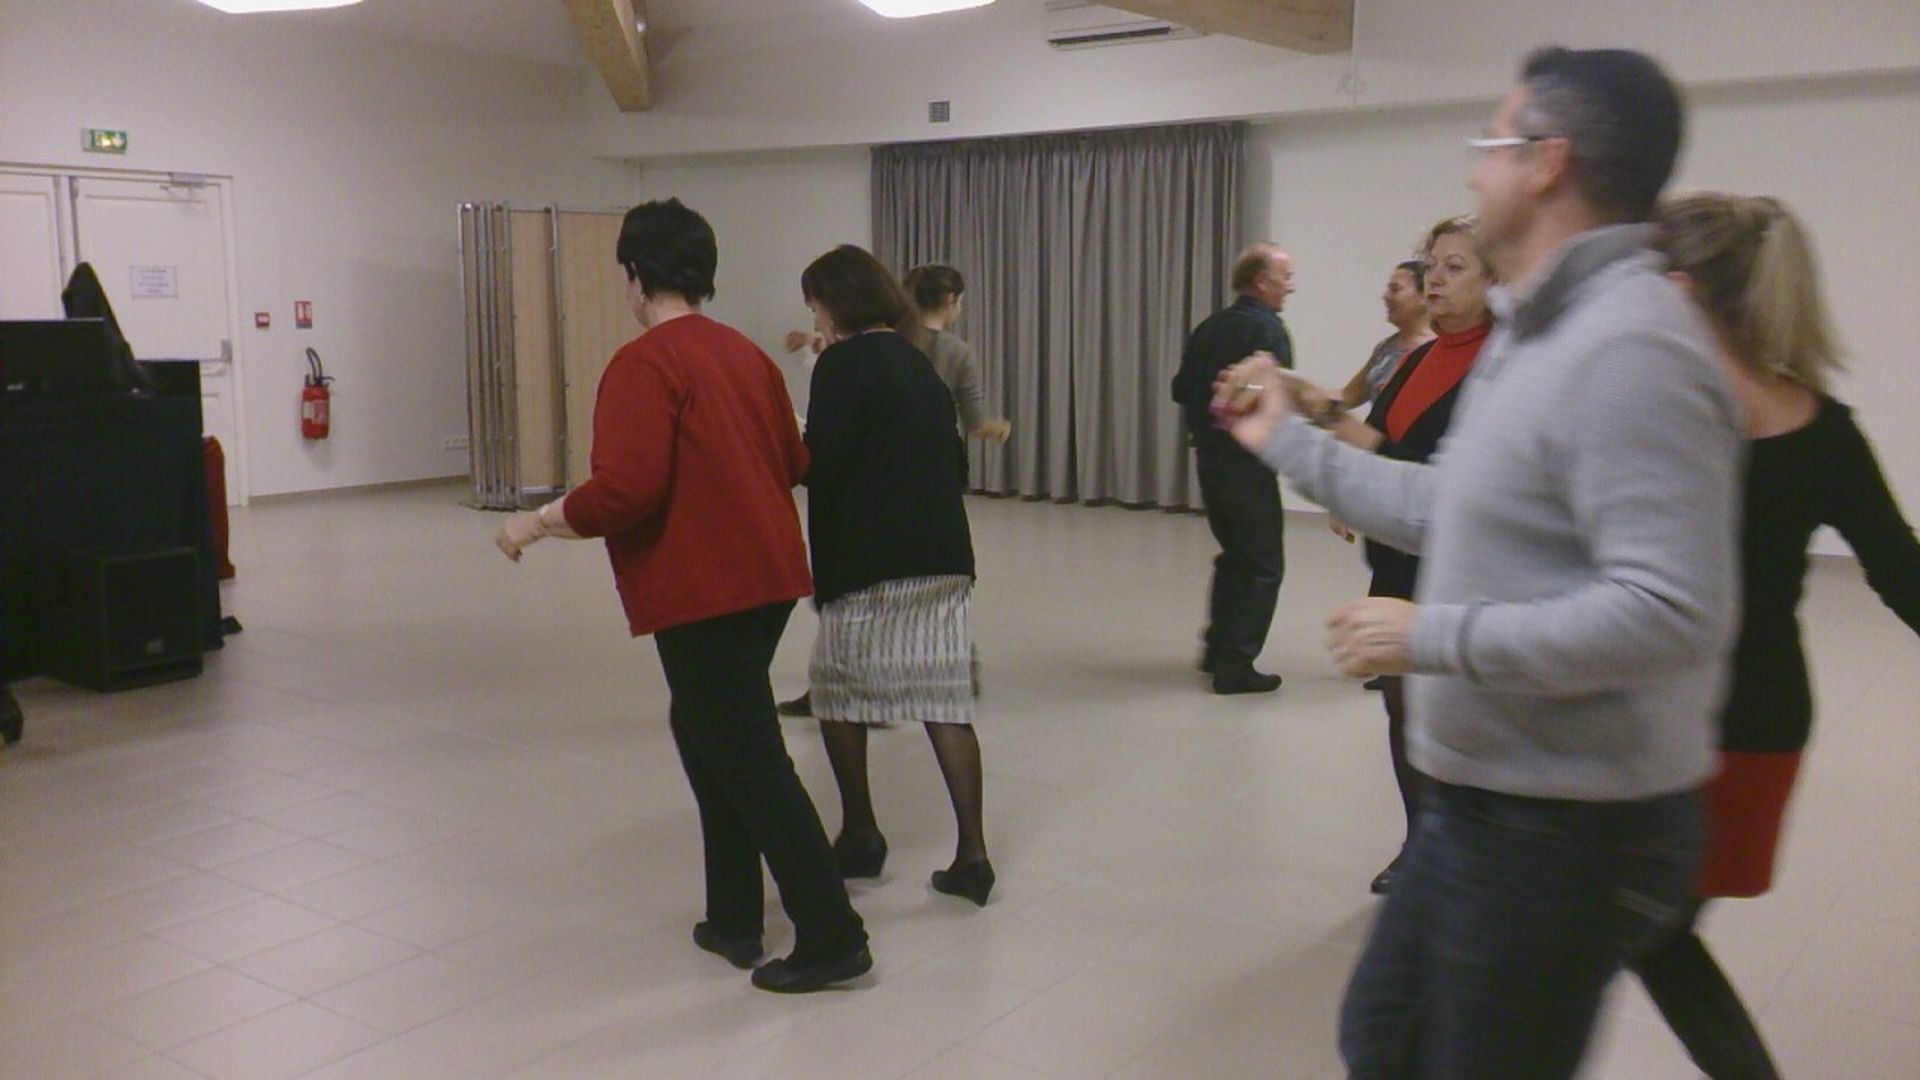 Danse de salon salsa rock for Rumba danse de salon